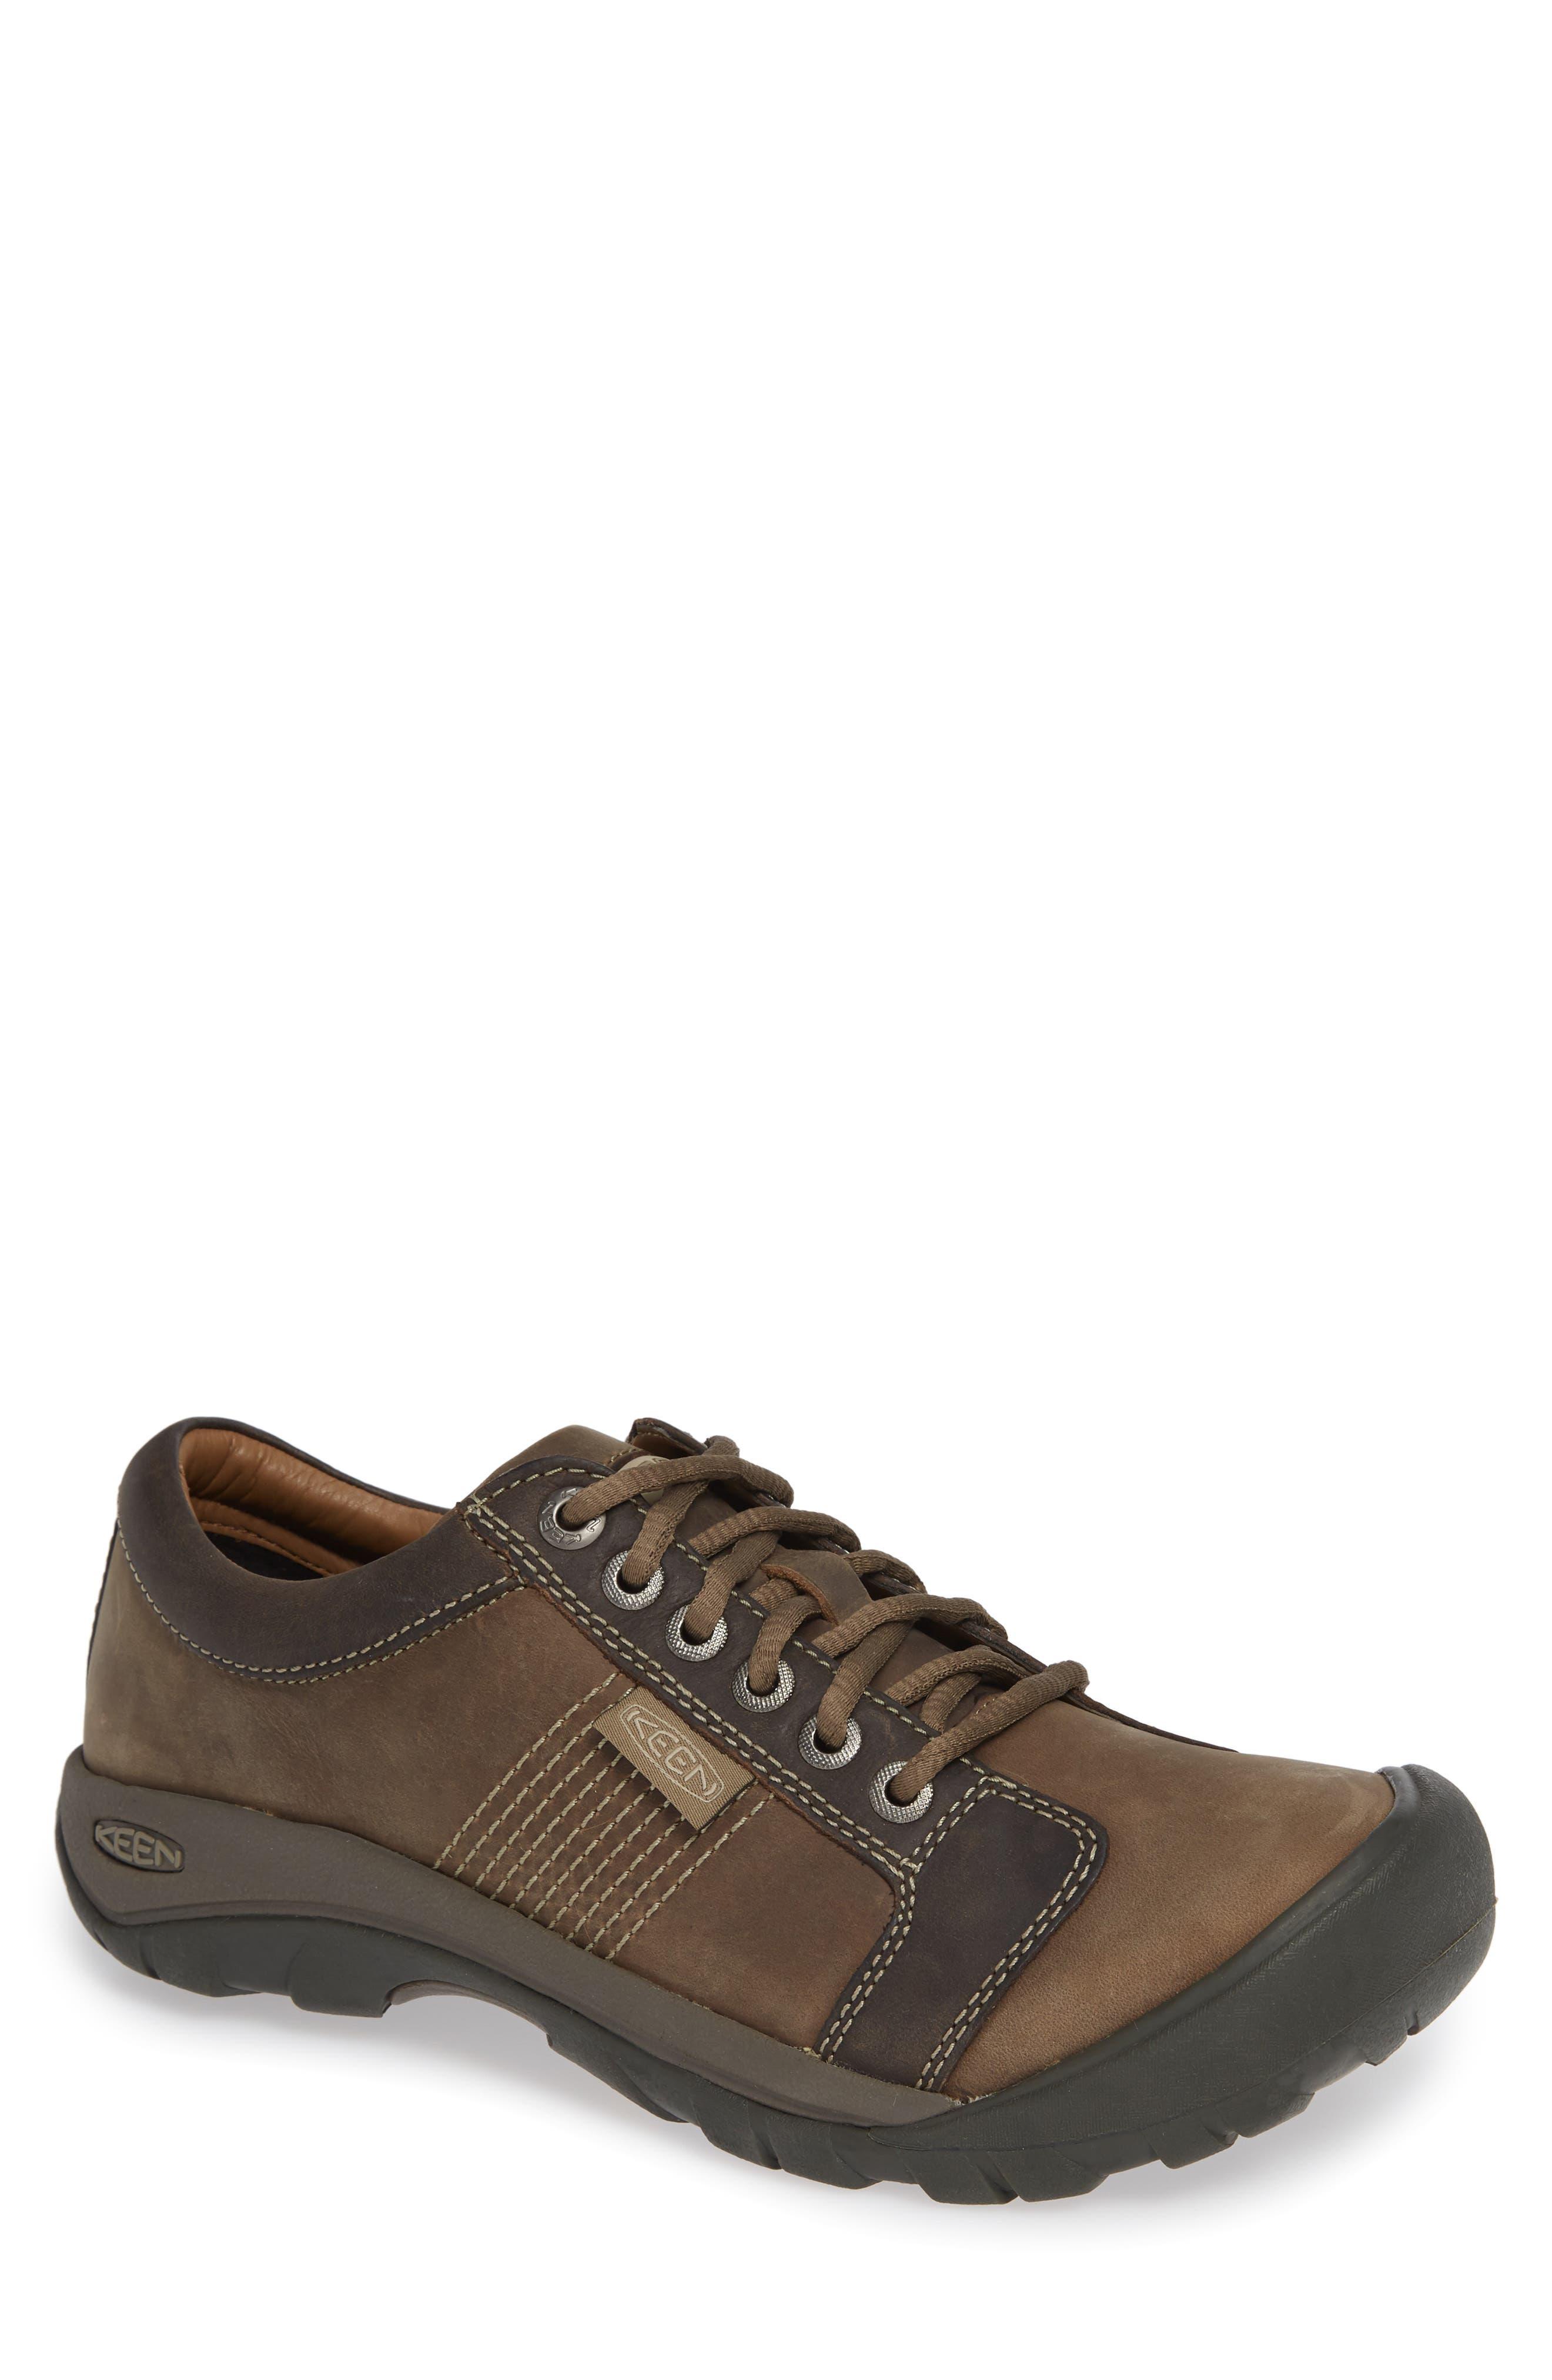 best sale san francisco good quality Men's Keen Shoes | Nordstrom